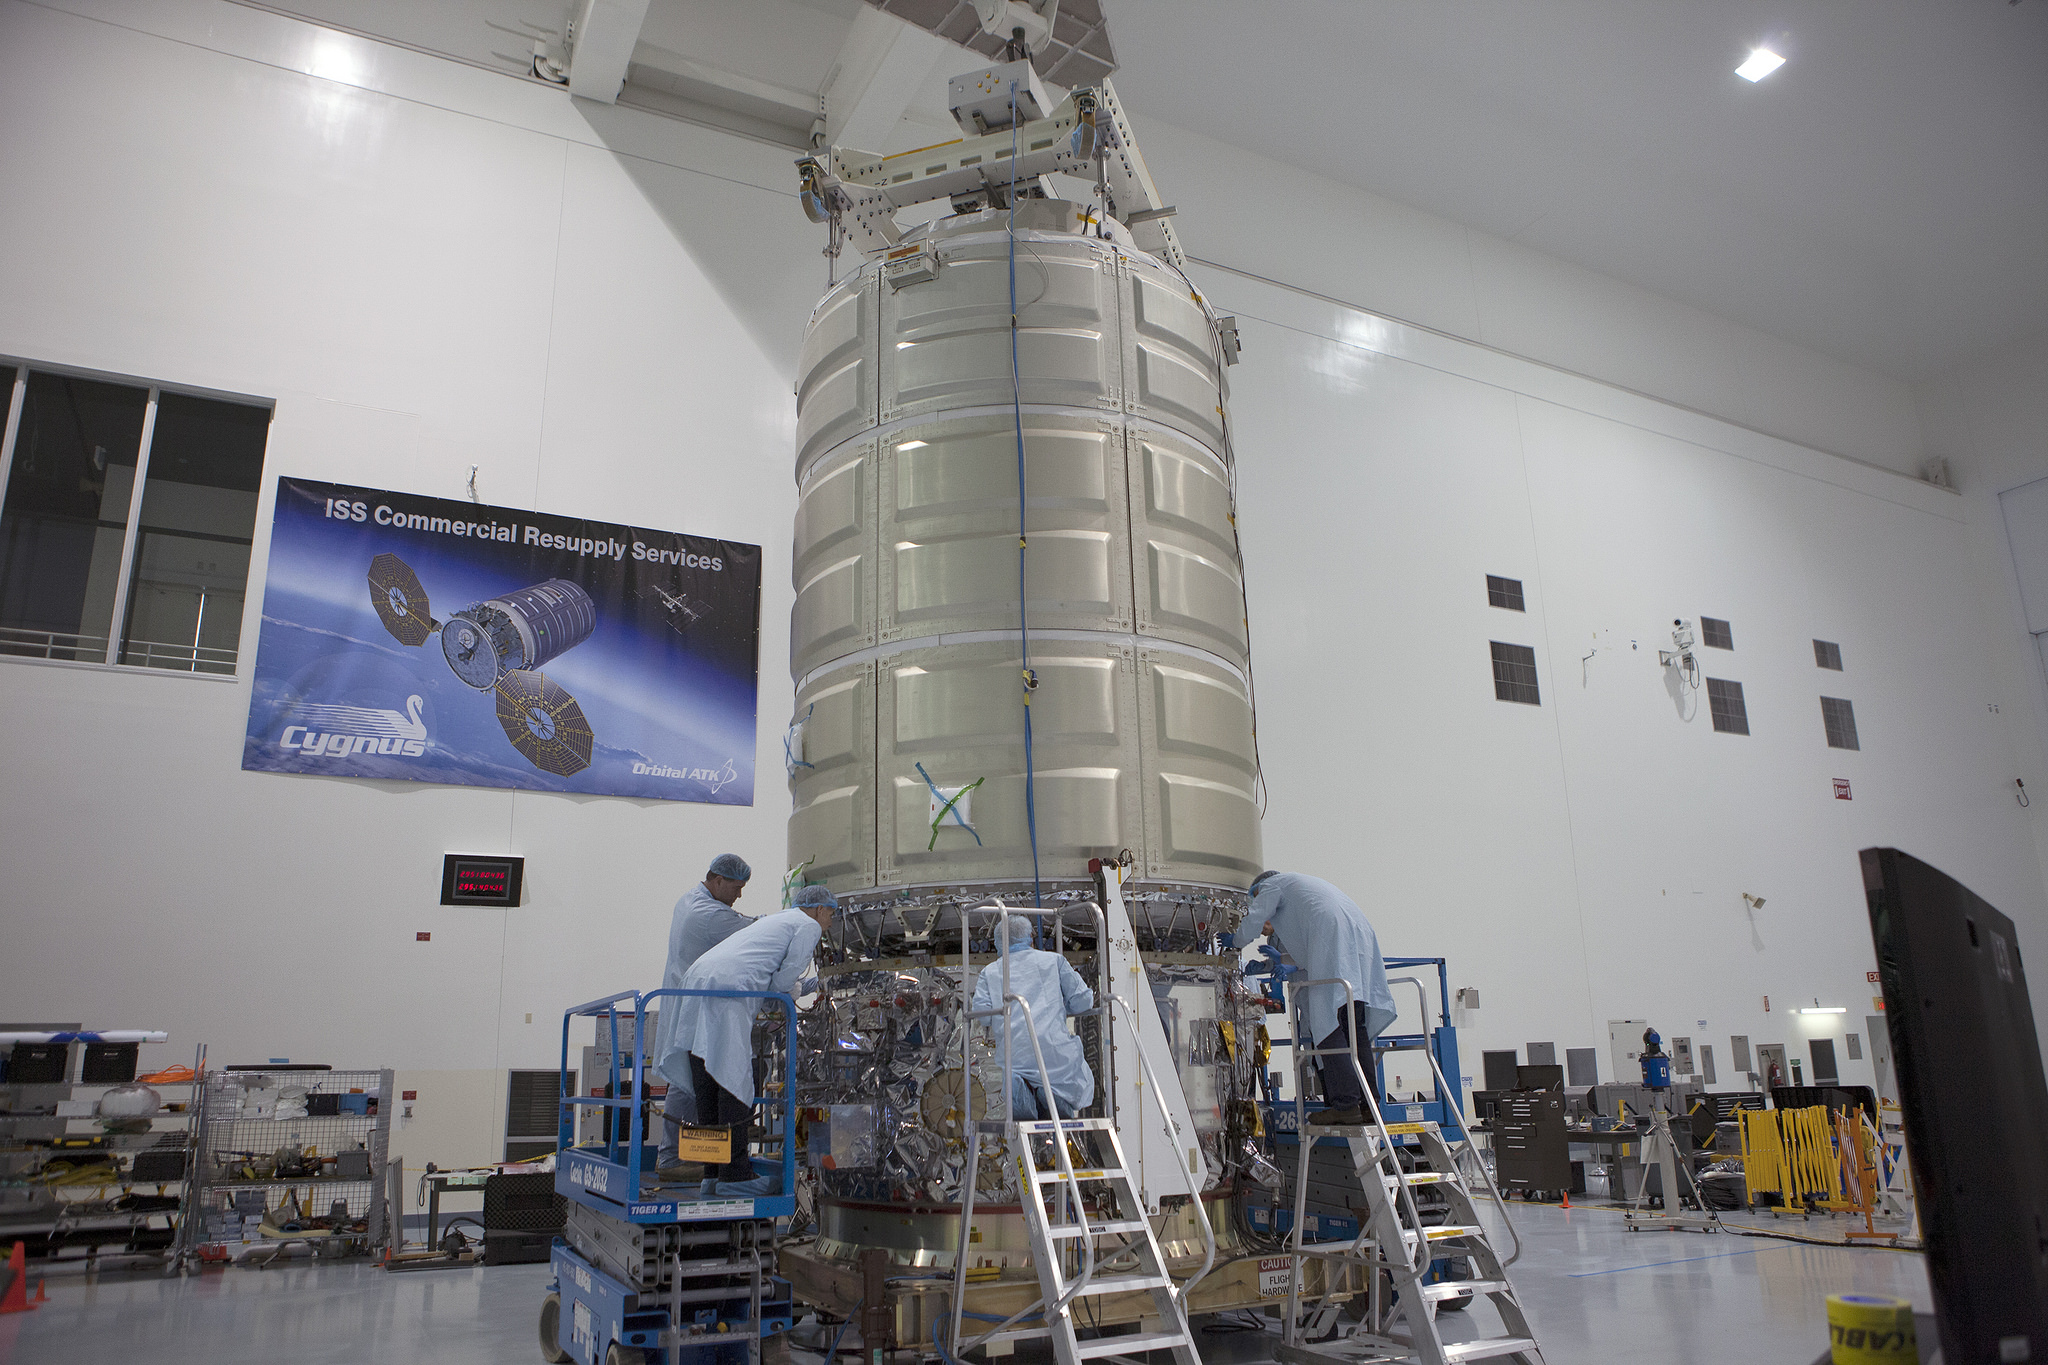 Cygnus's Pressurized Cargo Module